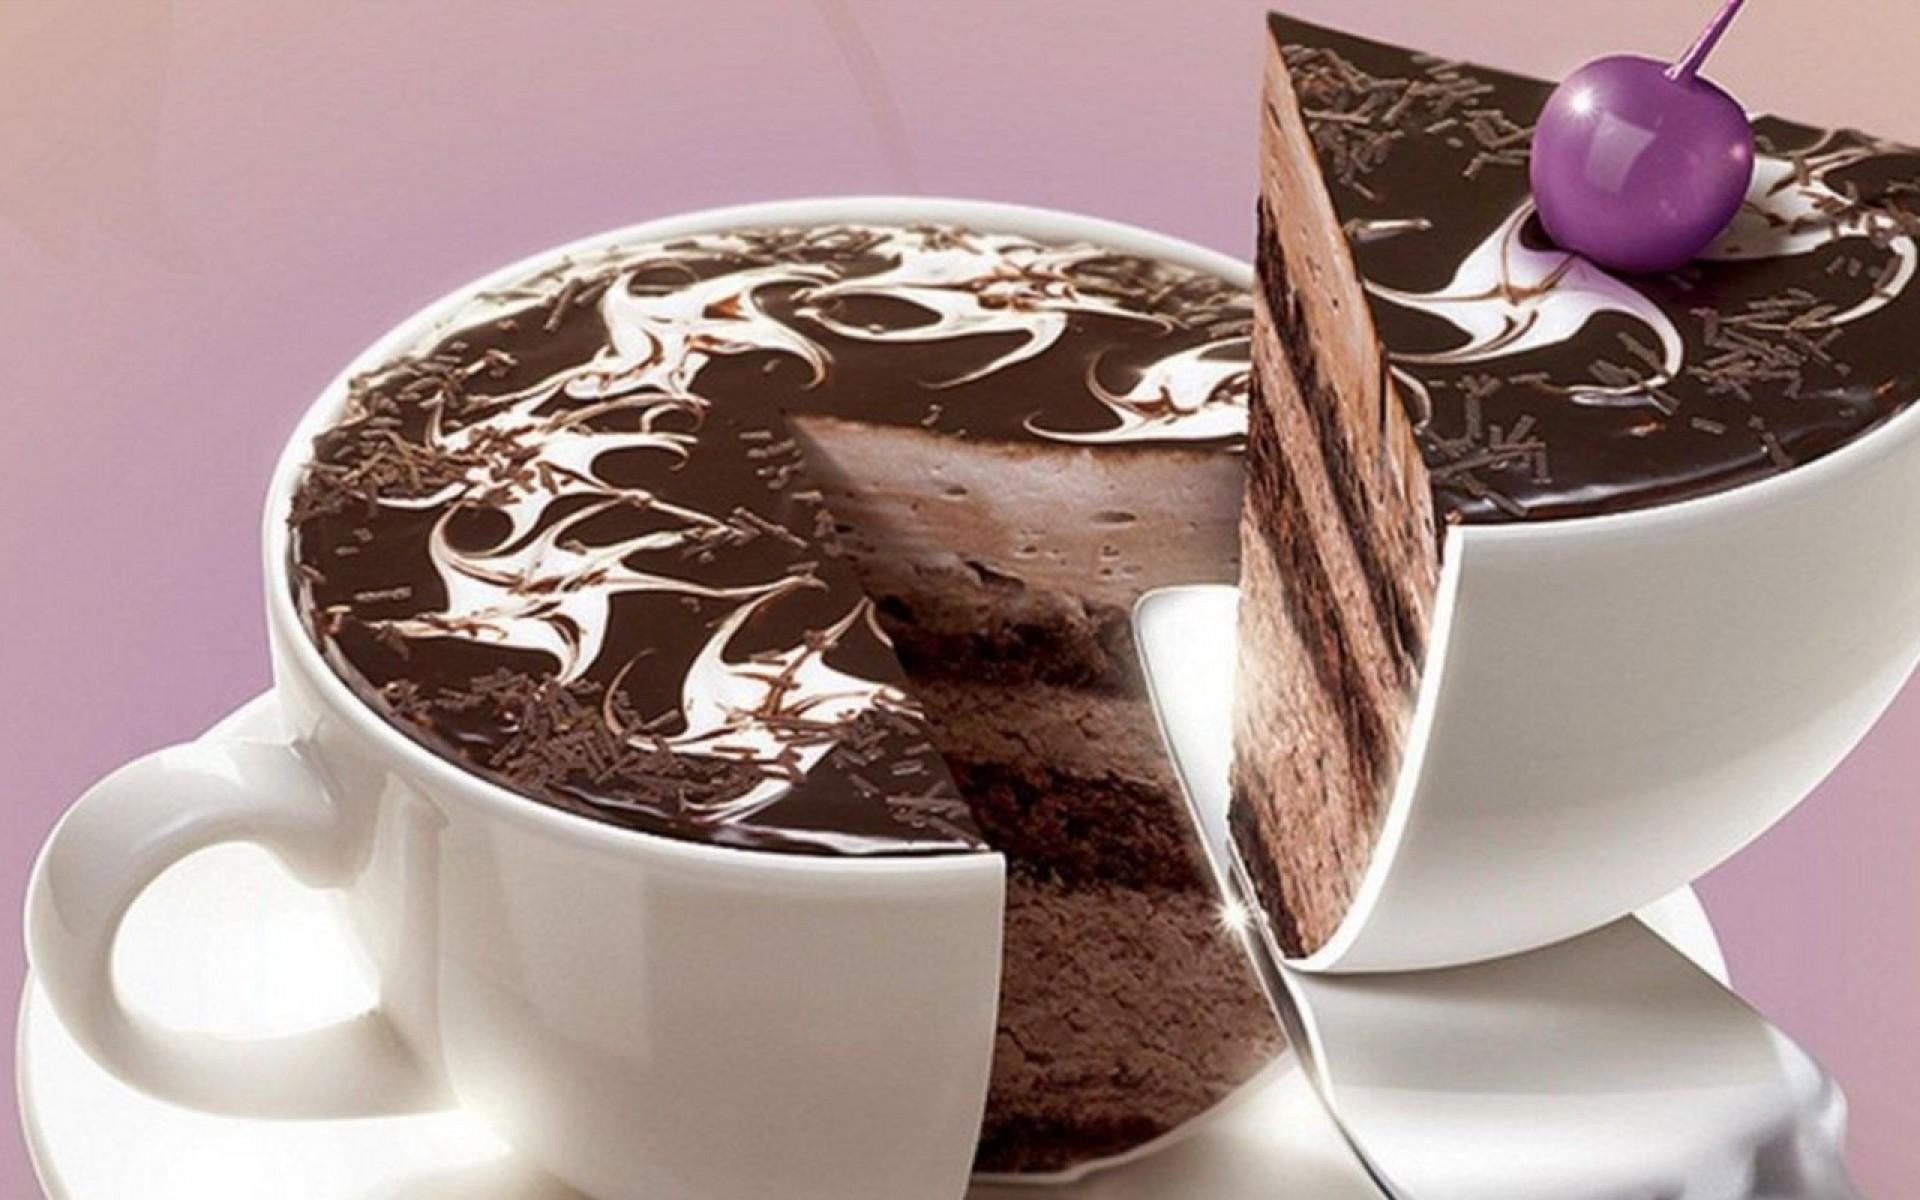 Home Food and Drink Chocolate Birthday Cake Desktop Wallpaper 1920x1200